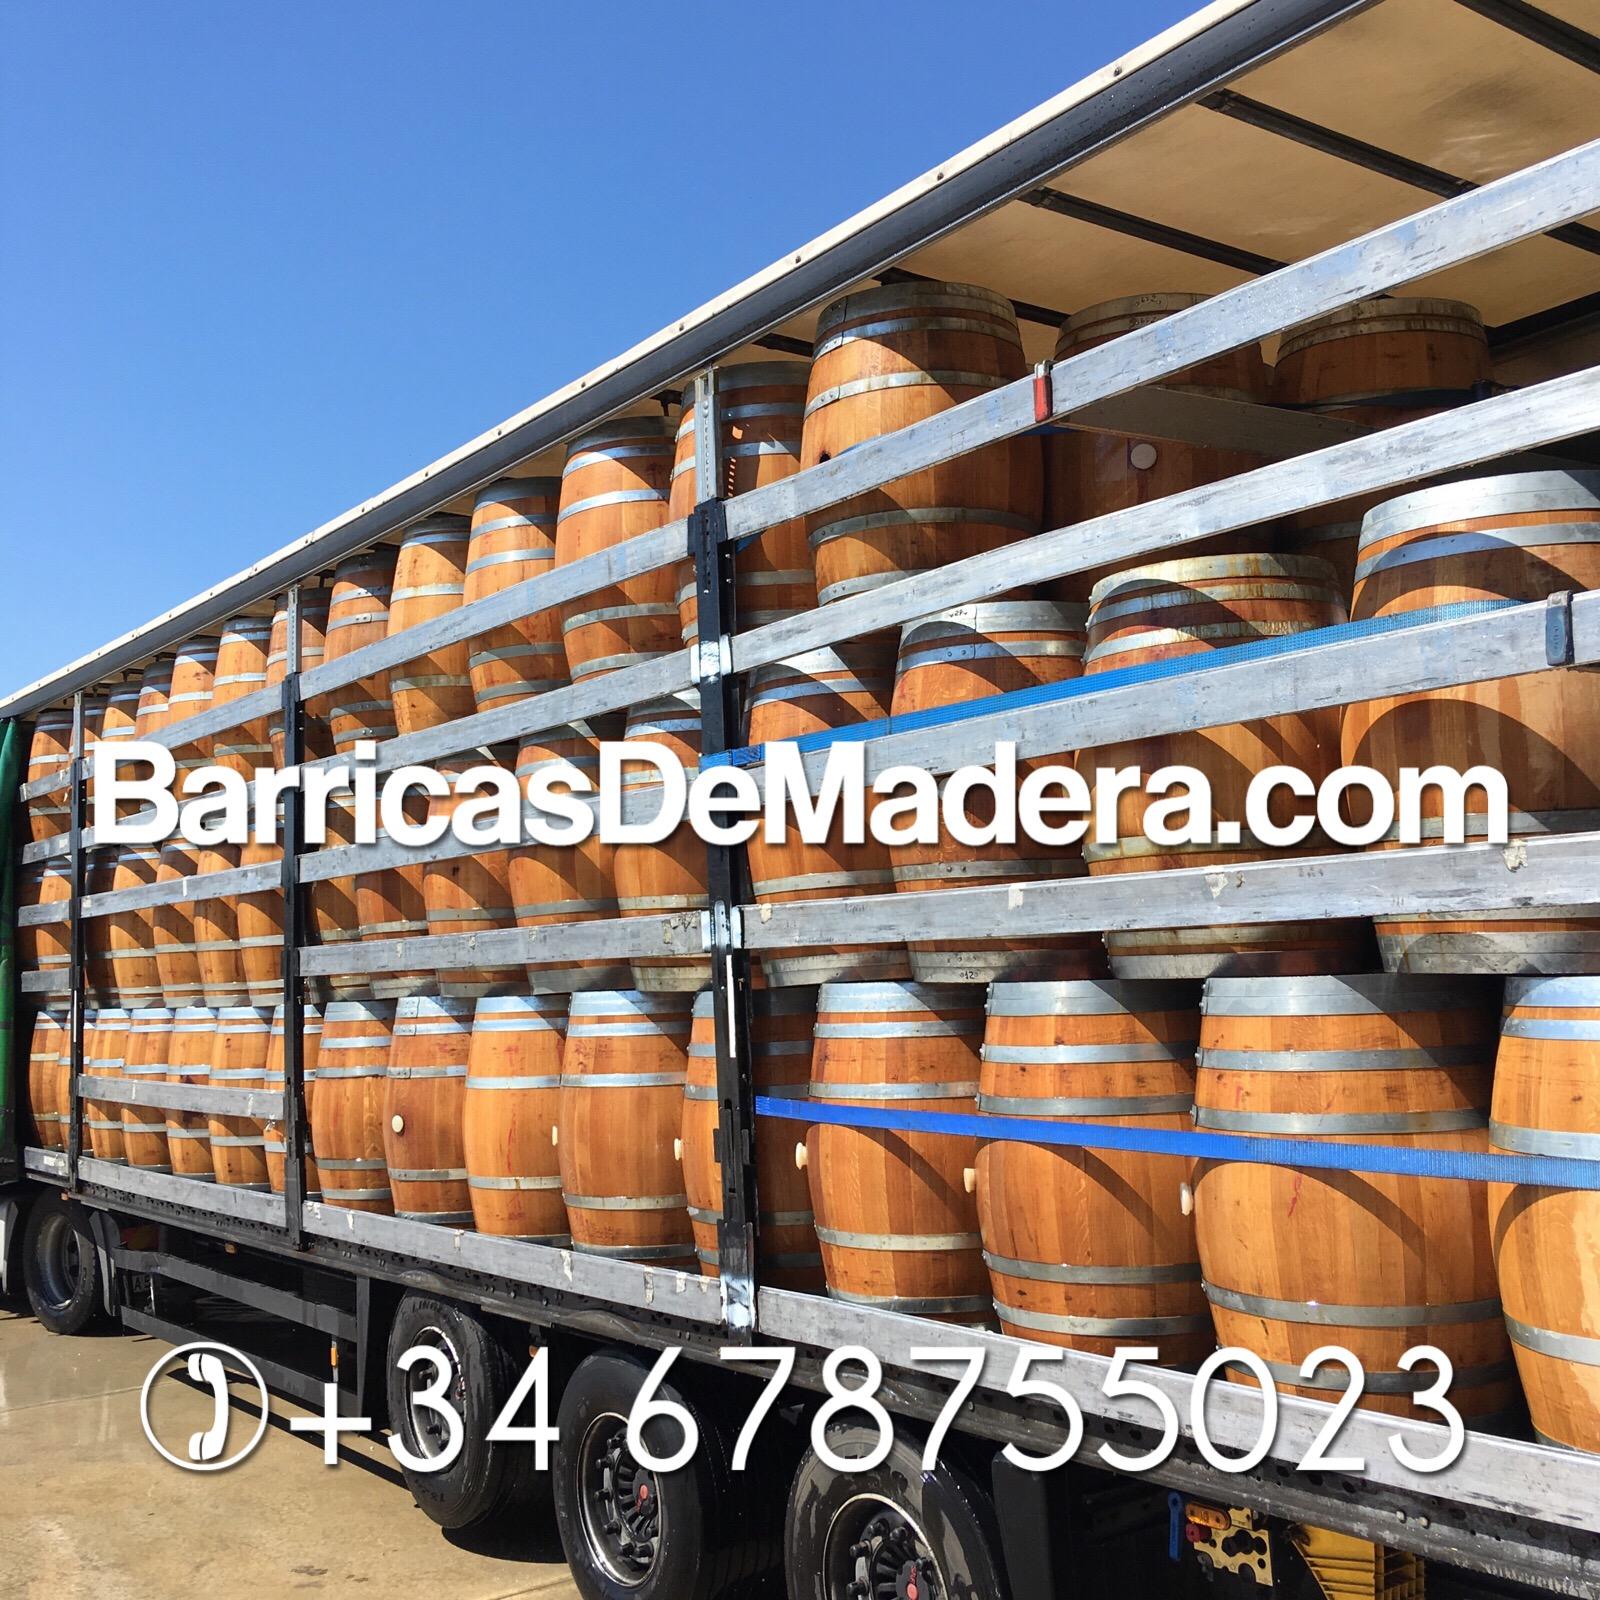 Red wine barrels for sale